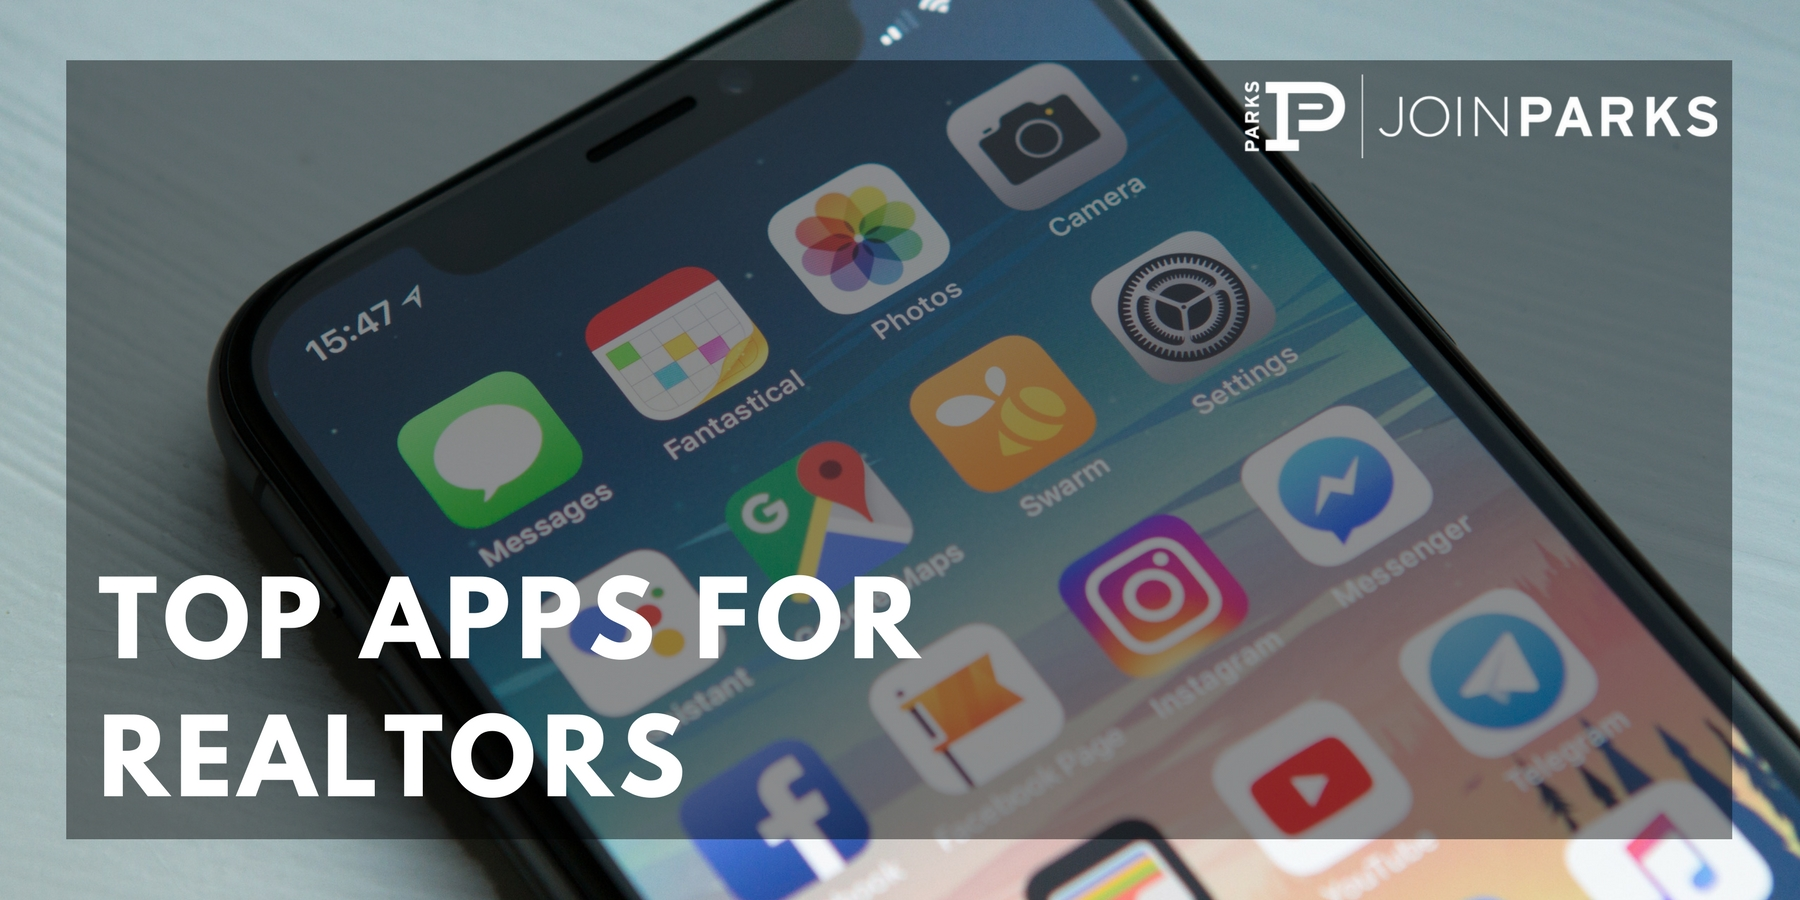 Copy of 5 Basic Facebook Tips for Realtors.jpg